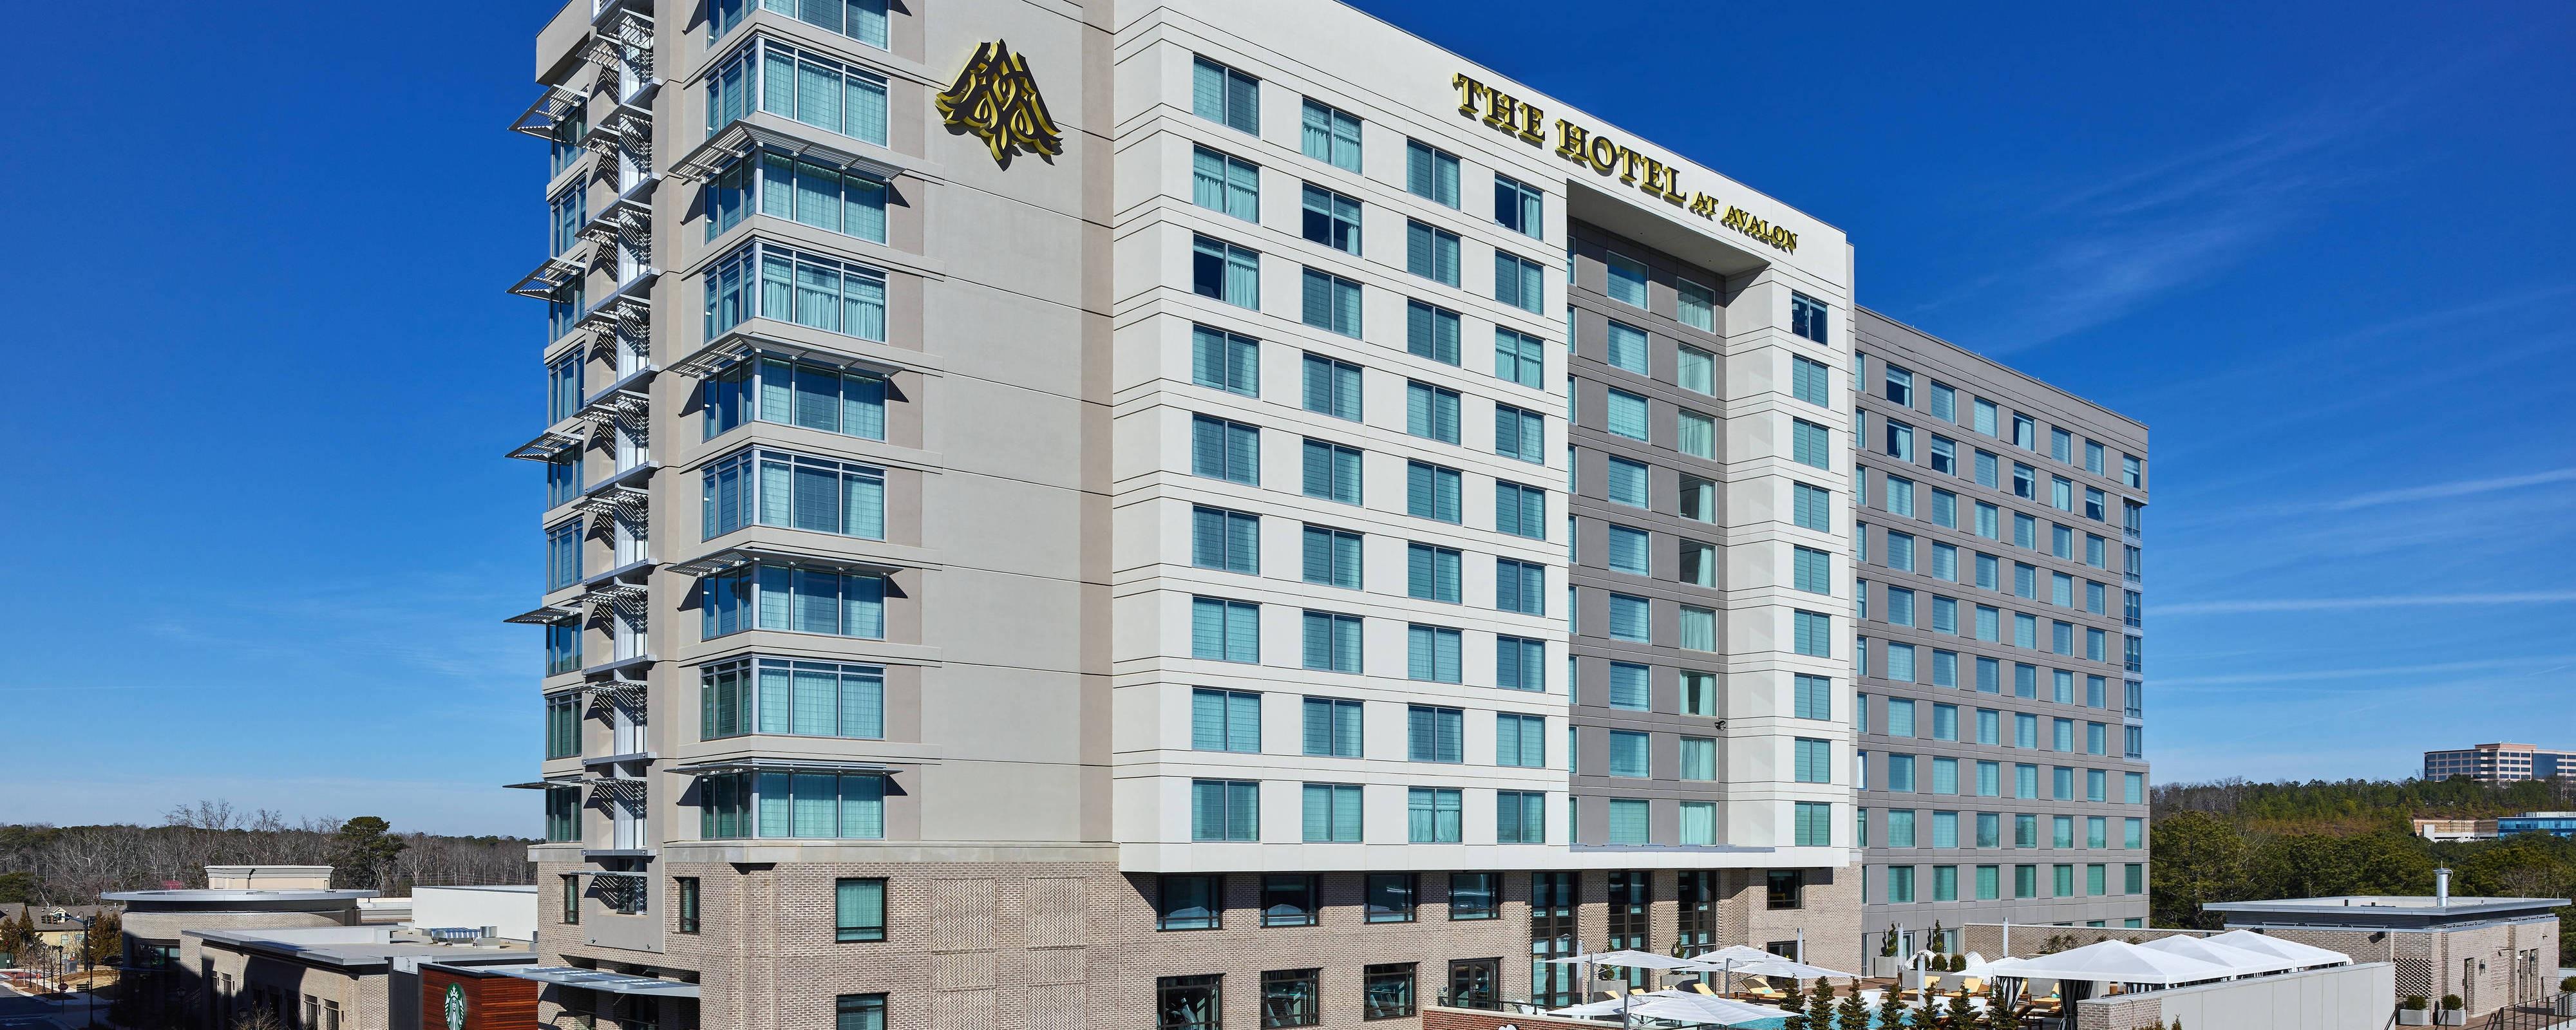 alpharetta ga hotels near roswell the hotel at avalon autograph rh marriott com